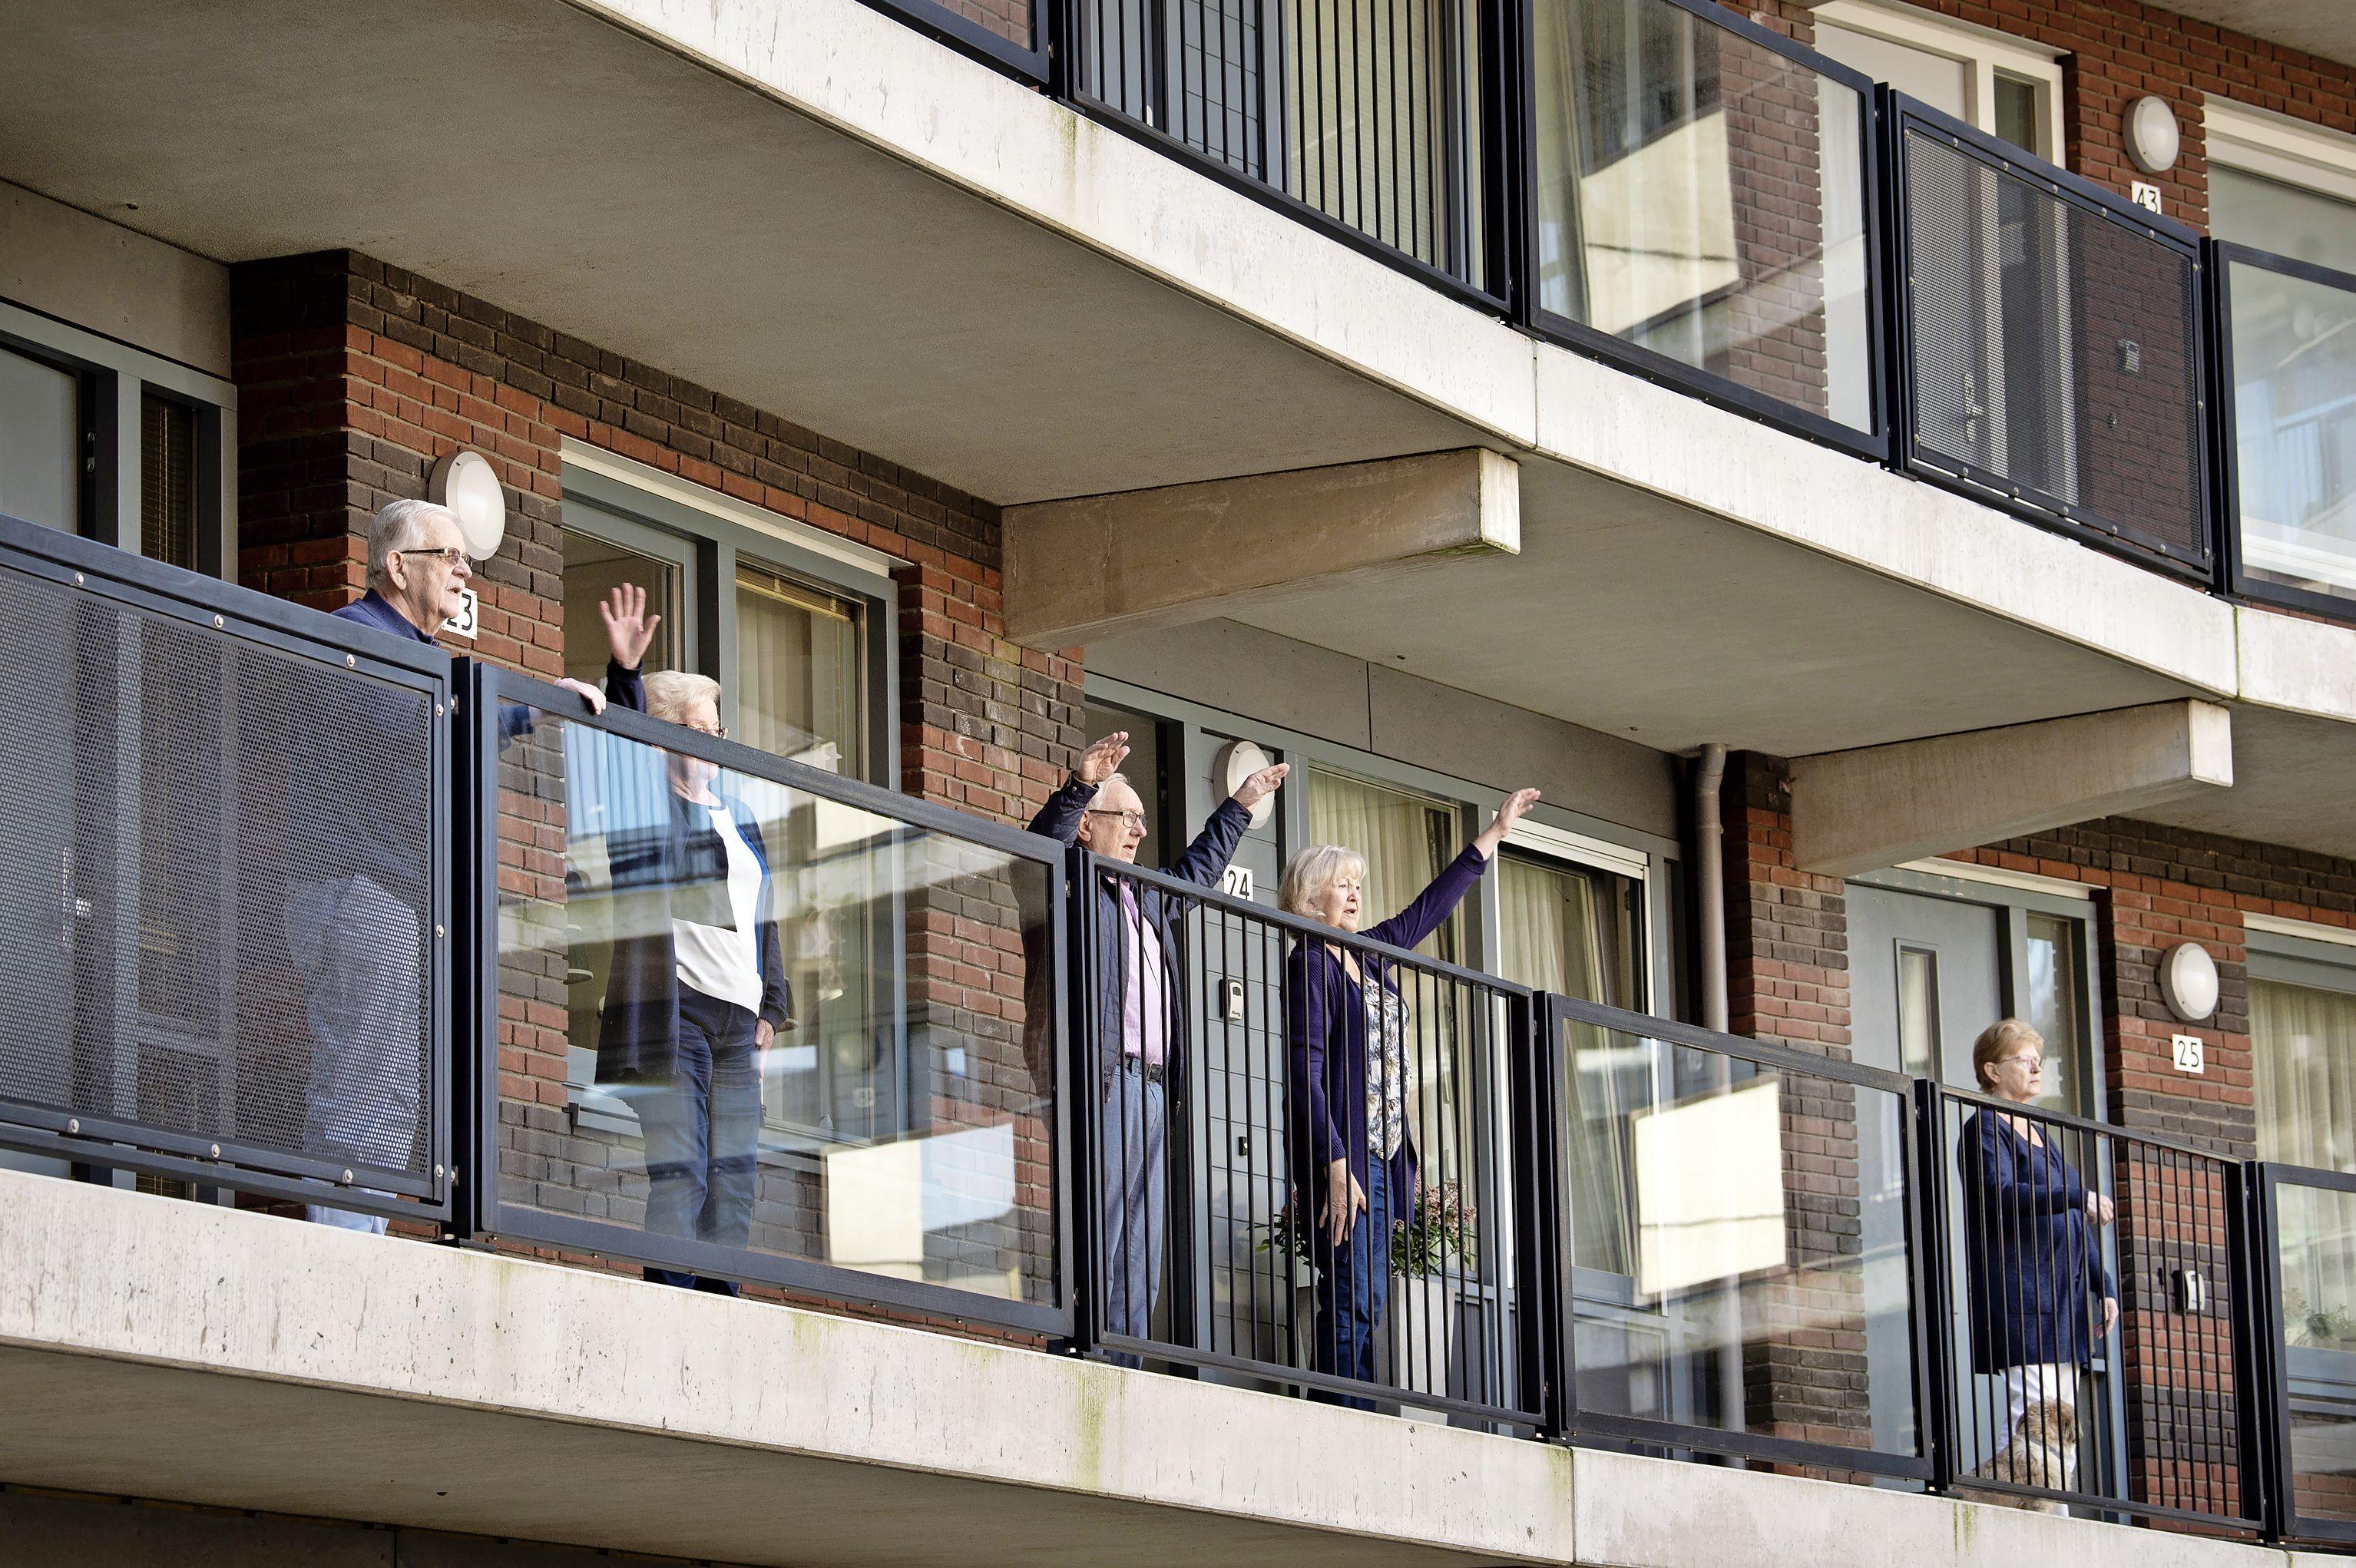 De Derde Helft mag Nationale Balkonbeweegdag in Leiderdorp nu wel aankondigen